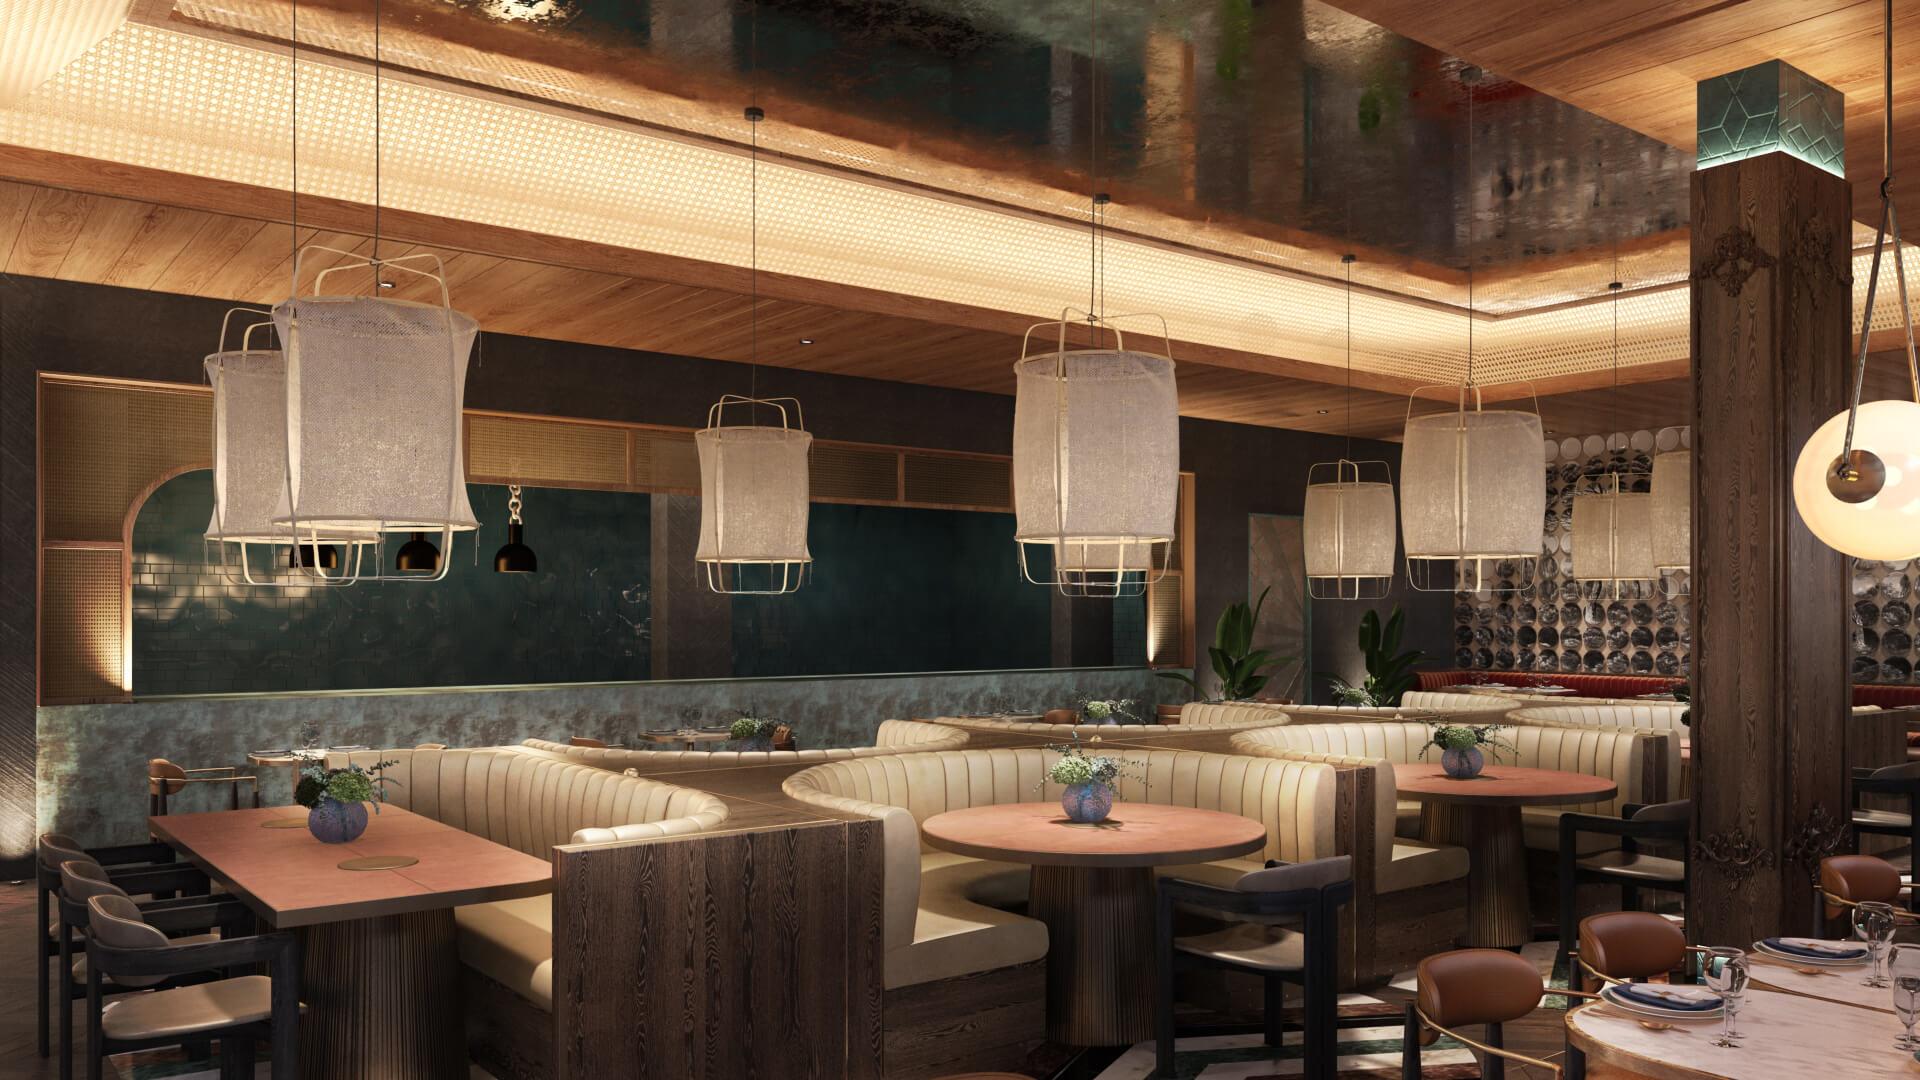 3D Image of a Restaurant Interior